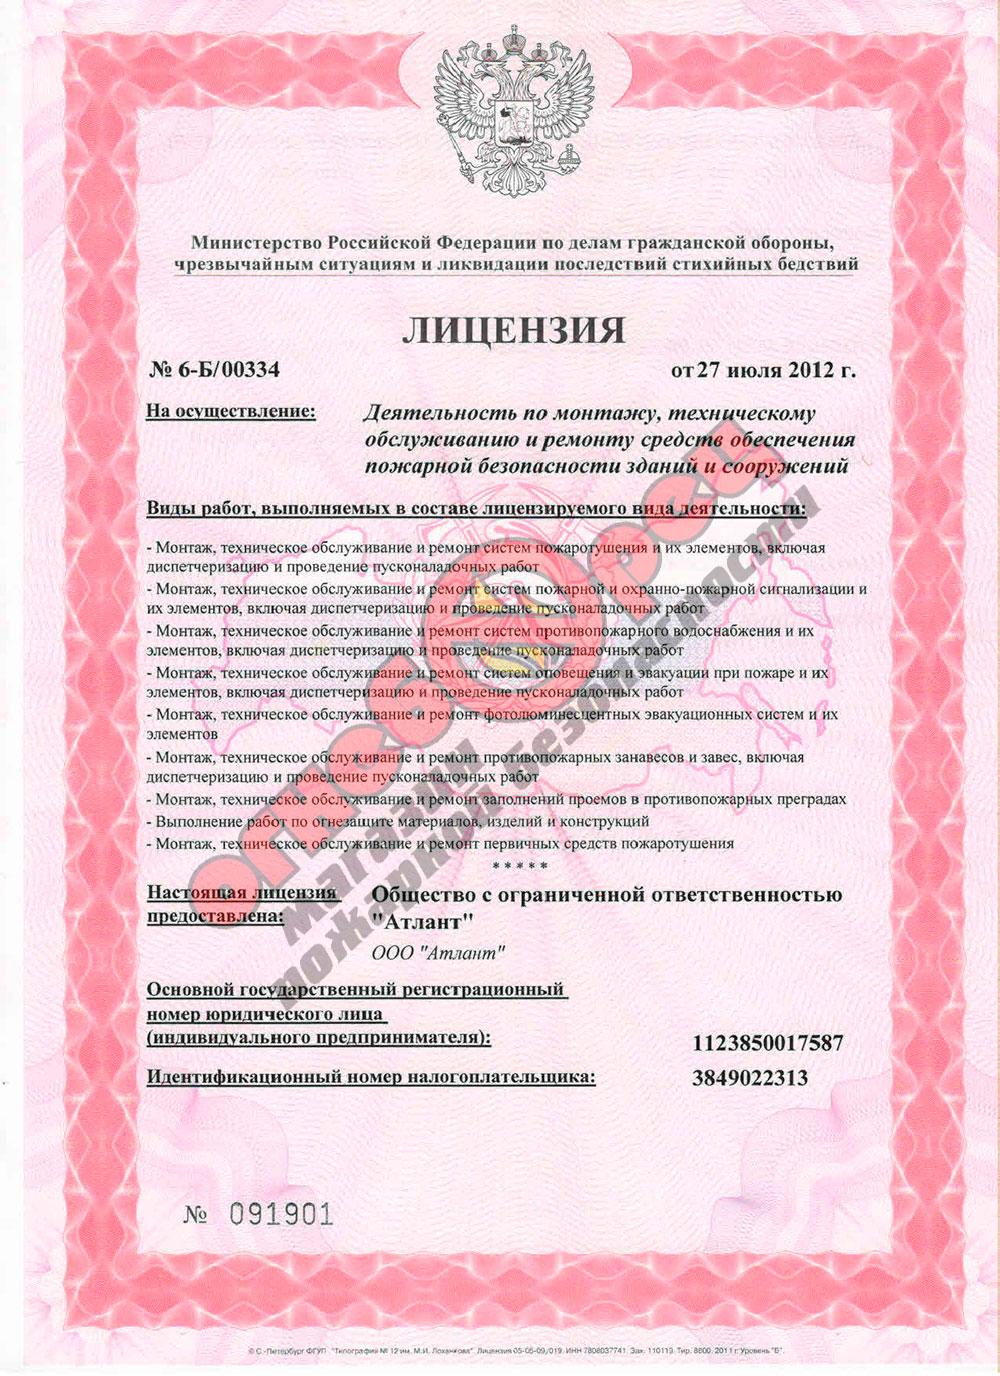 Белгород тех. эксплуатация зданий и сооружений